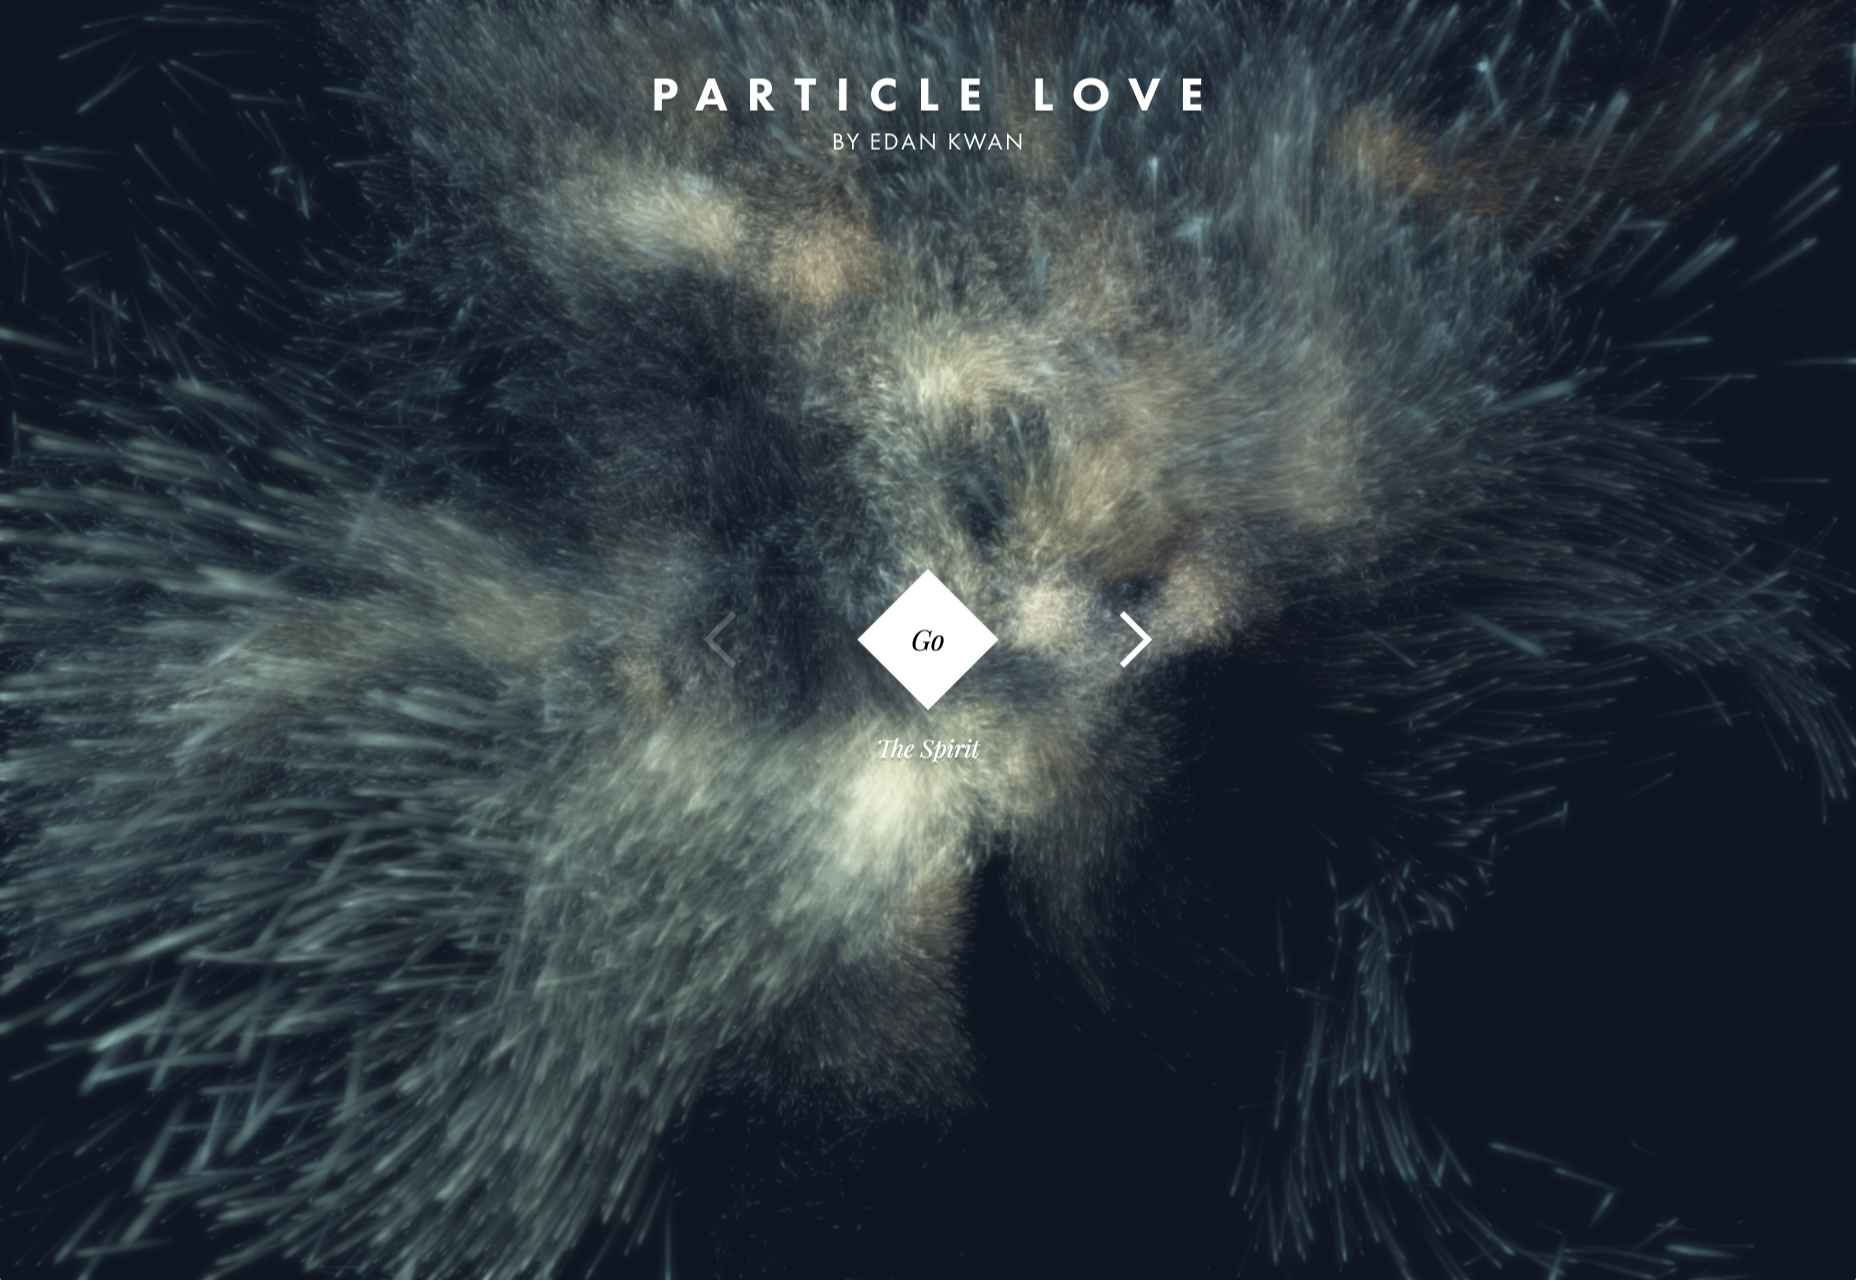 Анимация для сайта - частицы